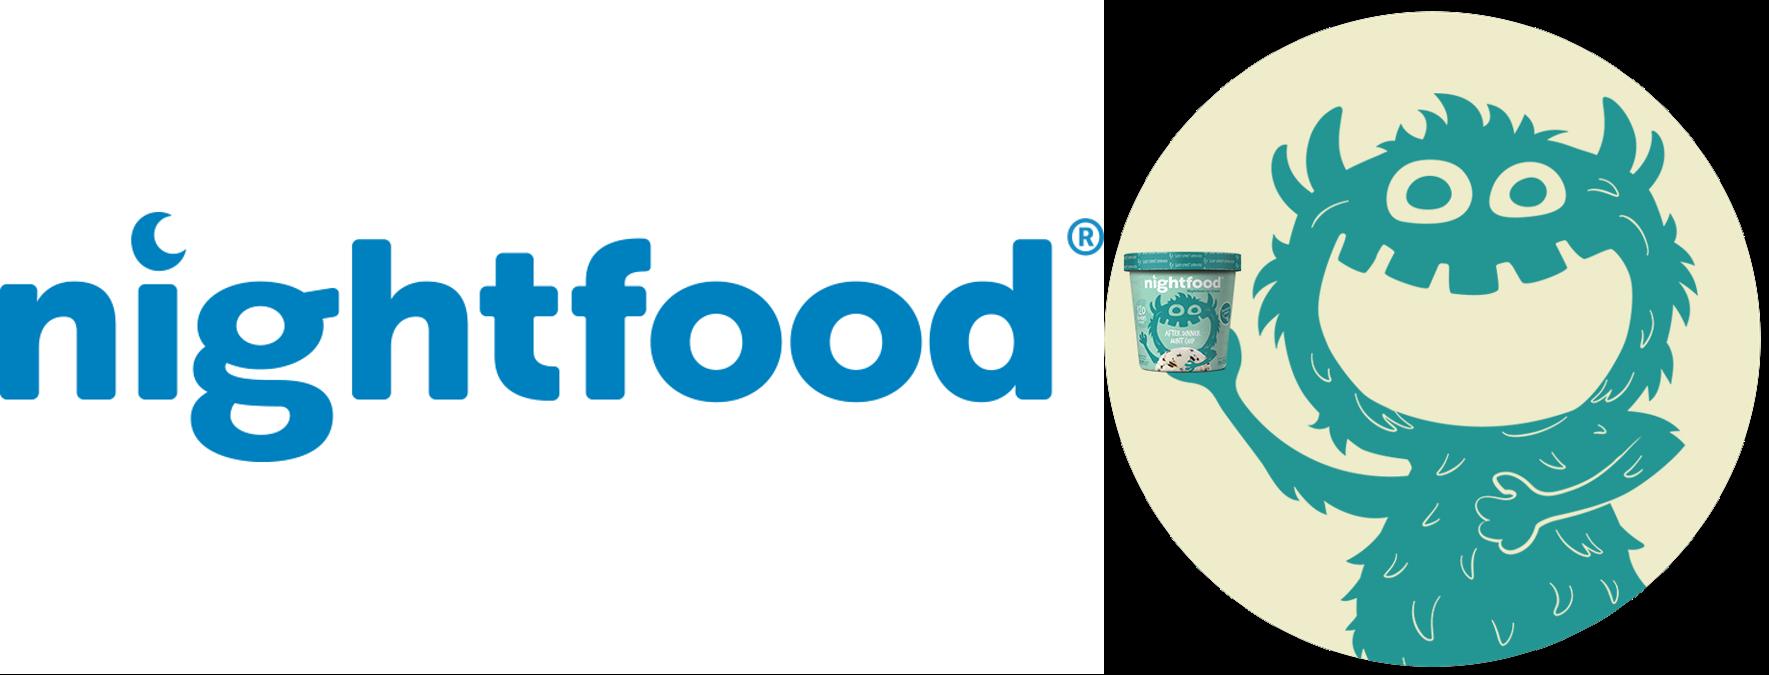 Nightfood Healthy Ice Cream | MSource Ideas